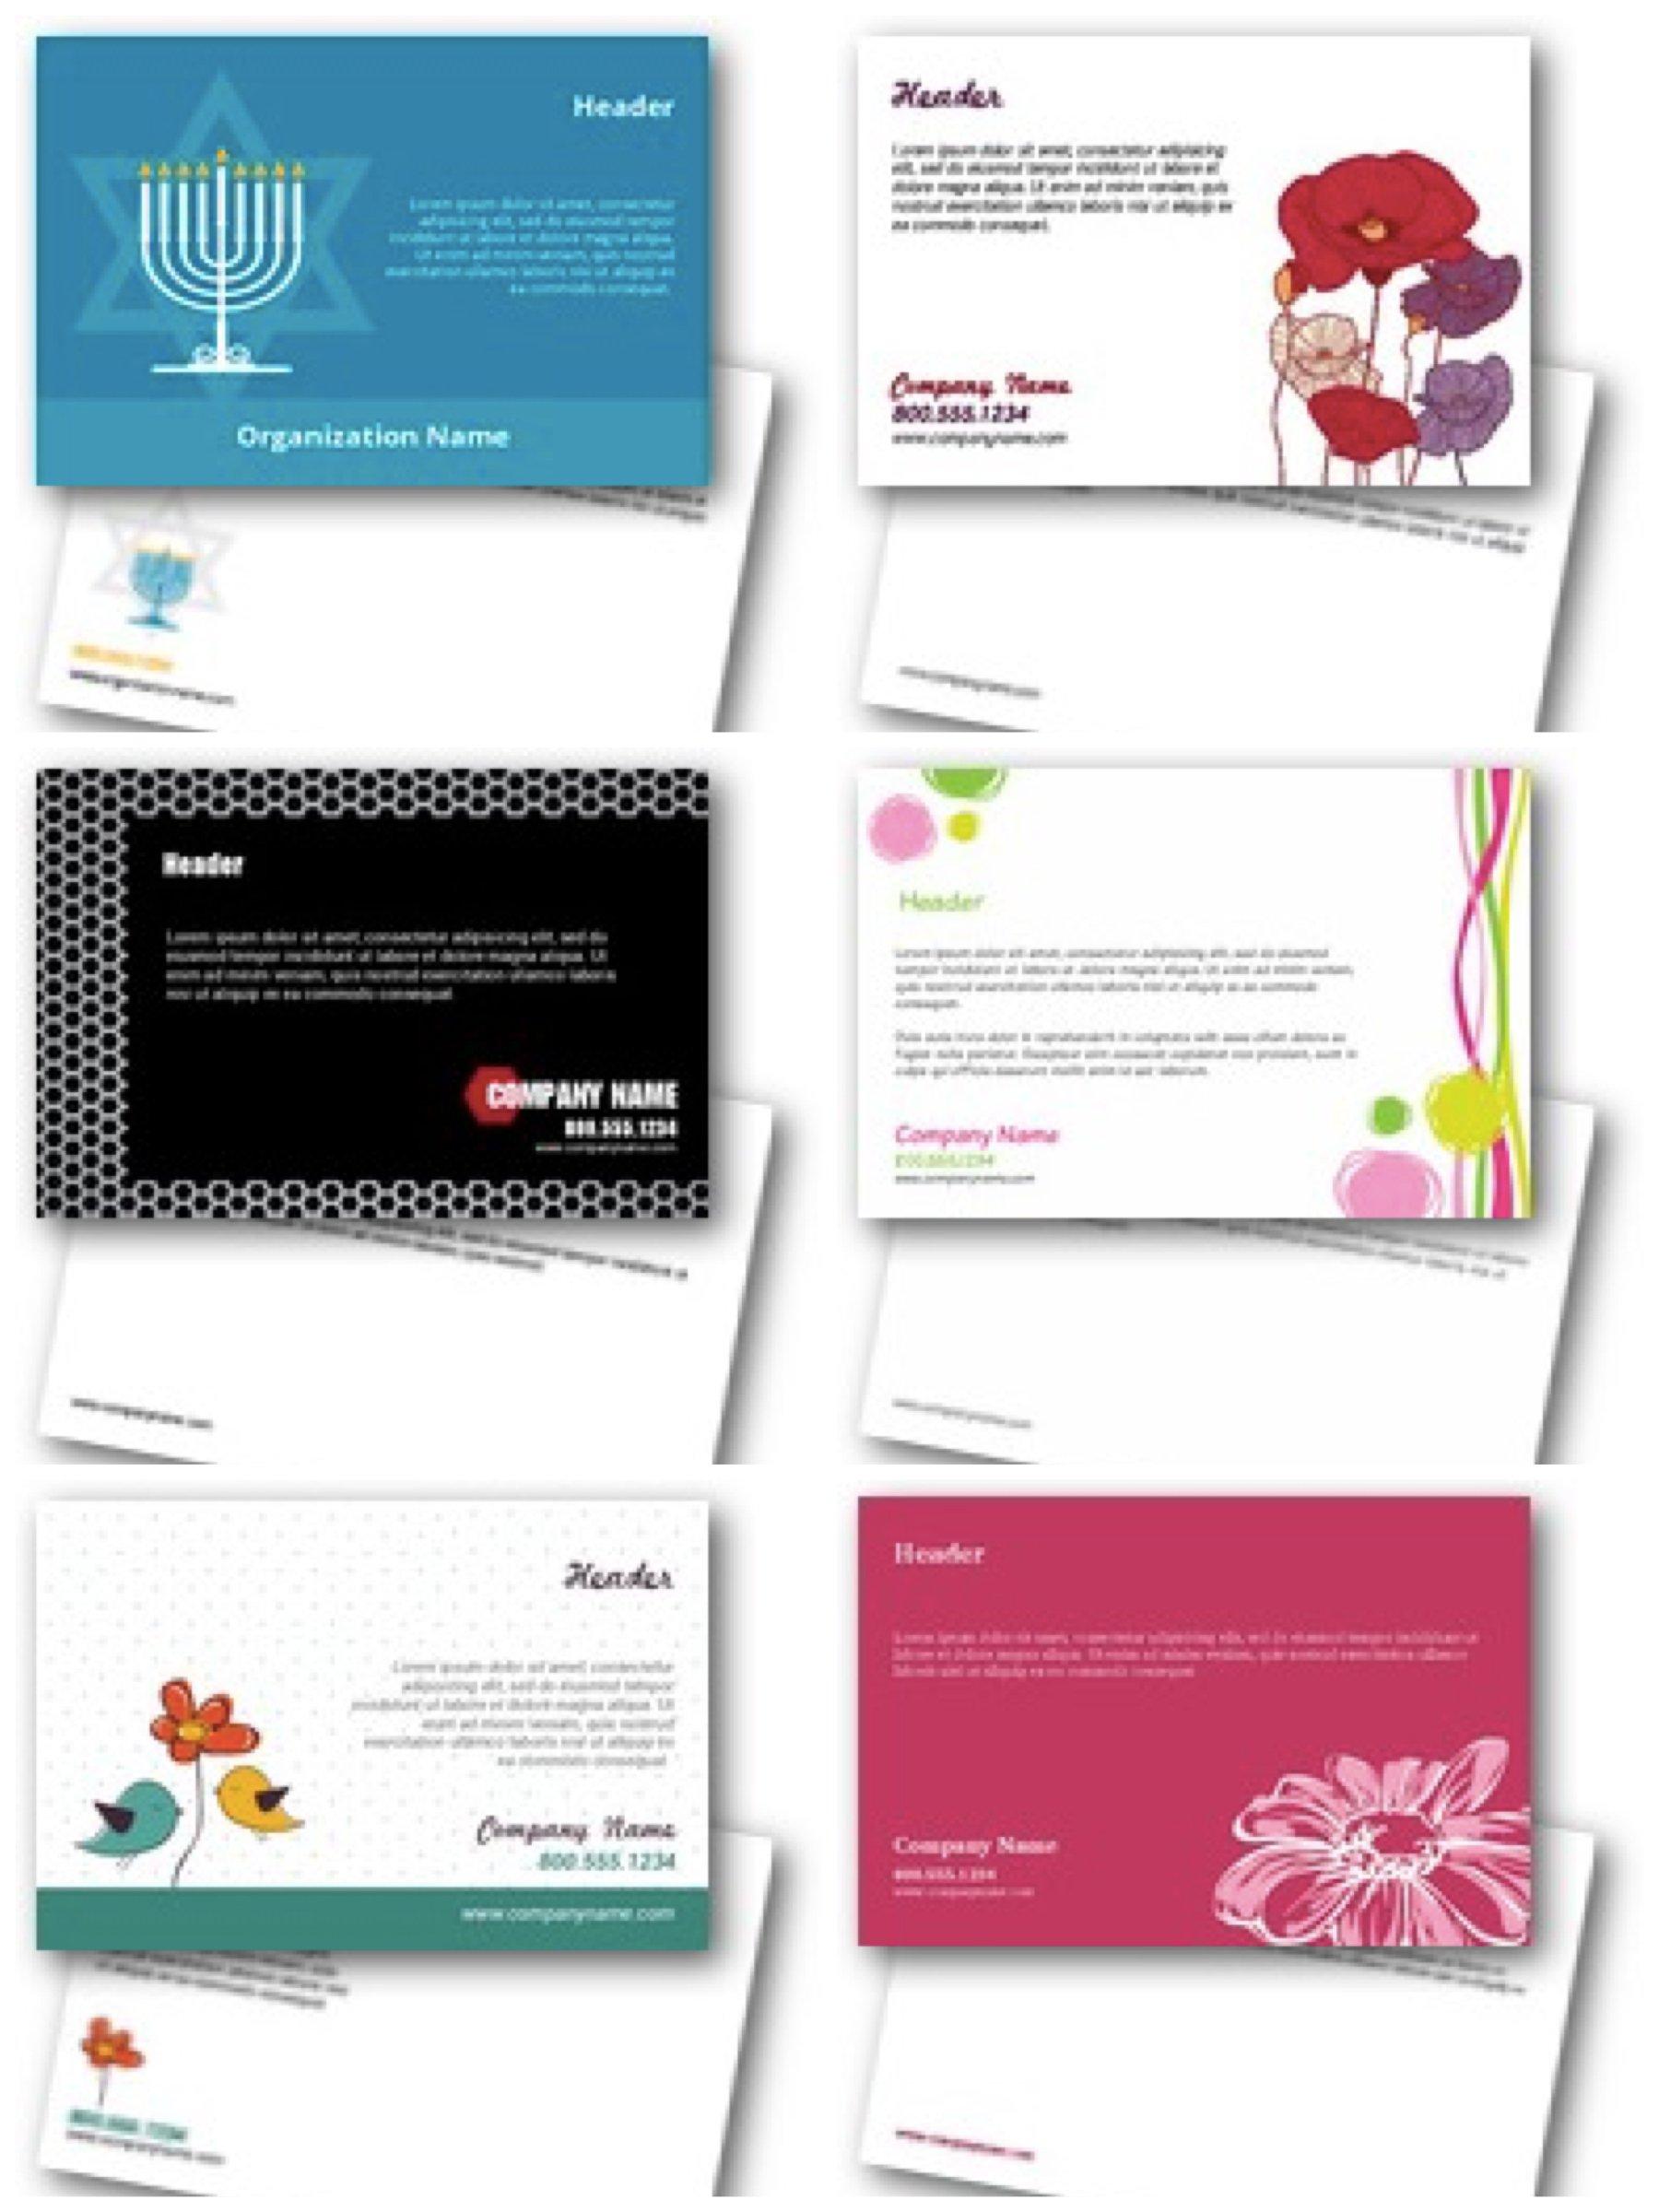 Postcard Invitations